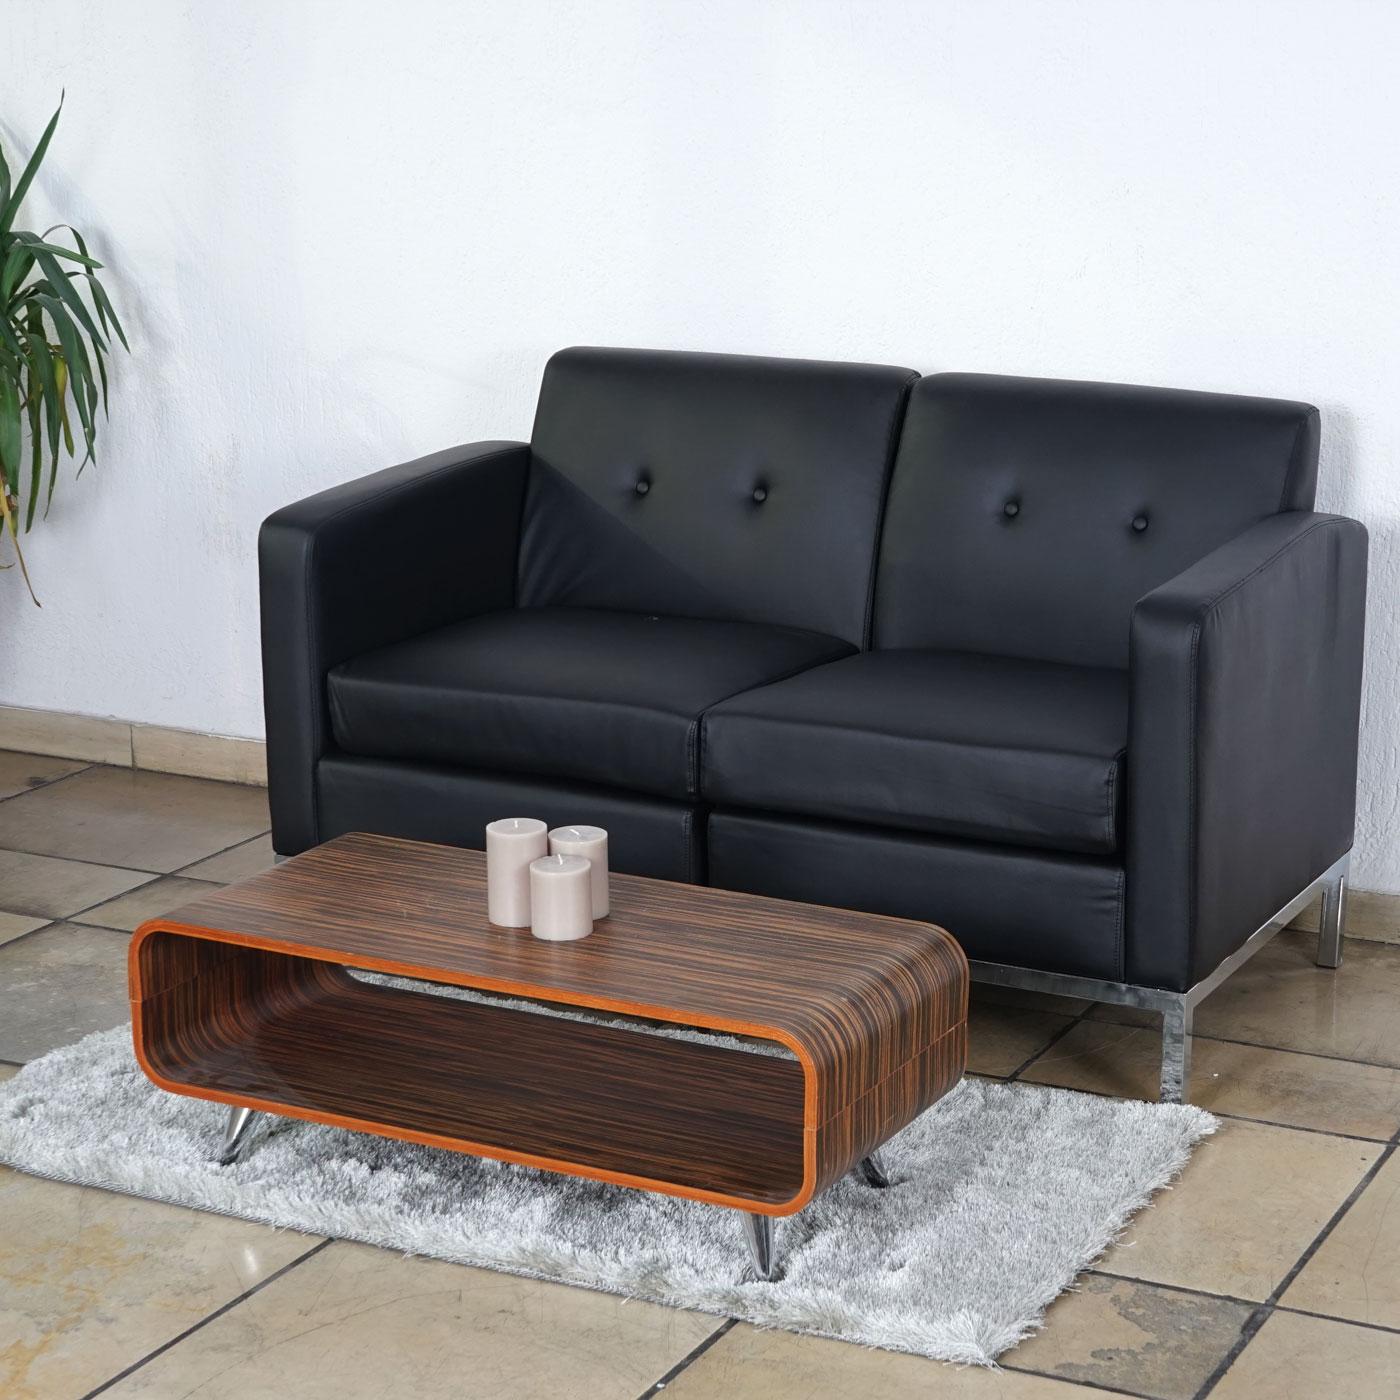 2er sofa hwc c19 modular sofa couch mit armlehnen. Black Bedroom Furniture Sets. Home Design Ideas